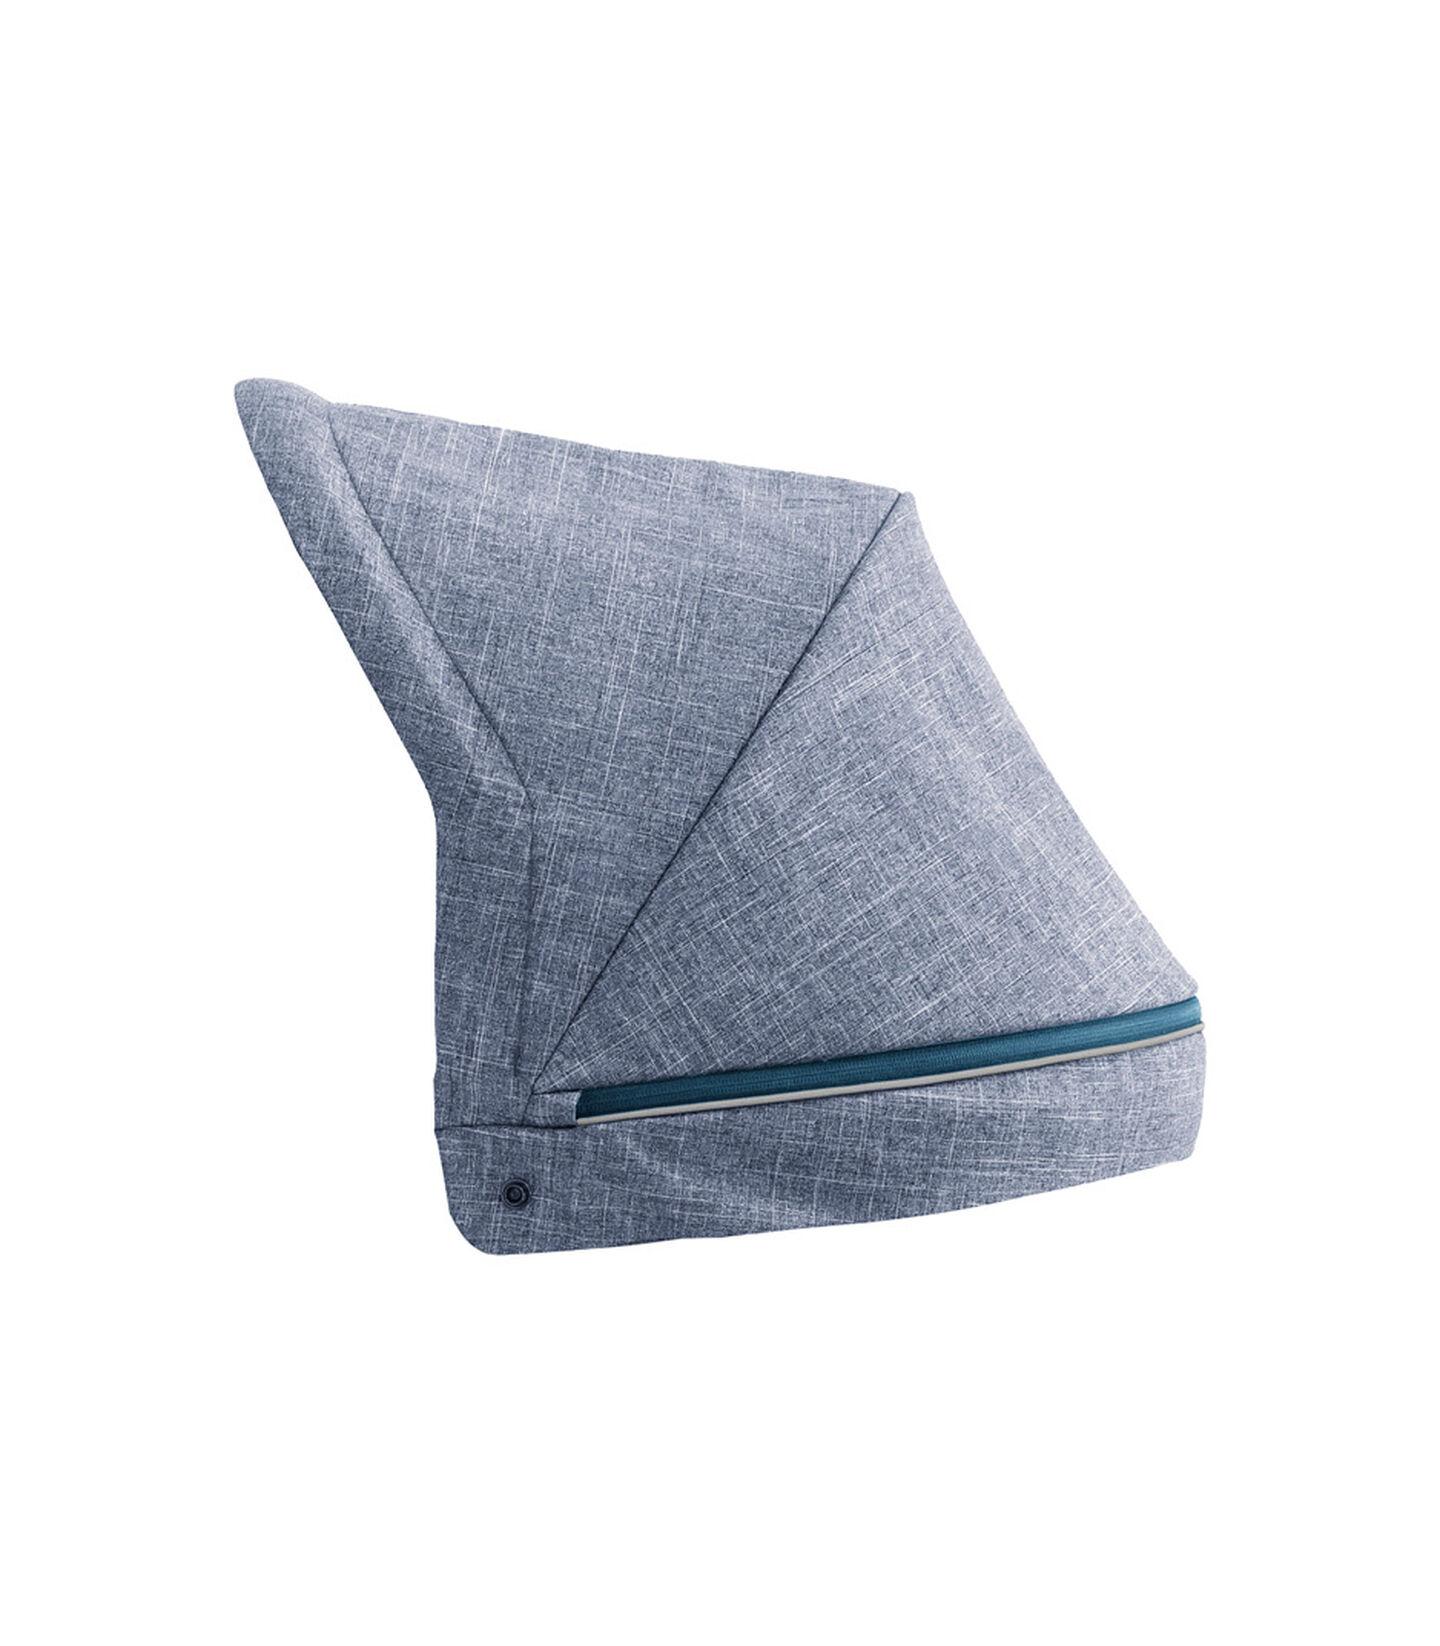 Stokke® Beat Canopy Blue Melange, Blue Melange, mainview view 2